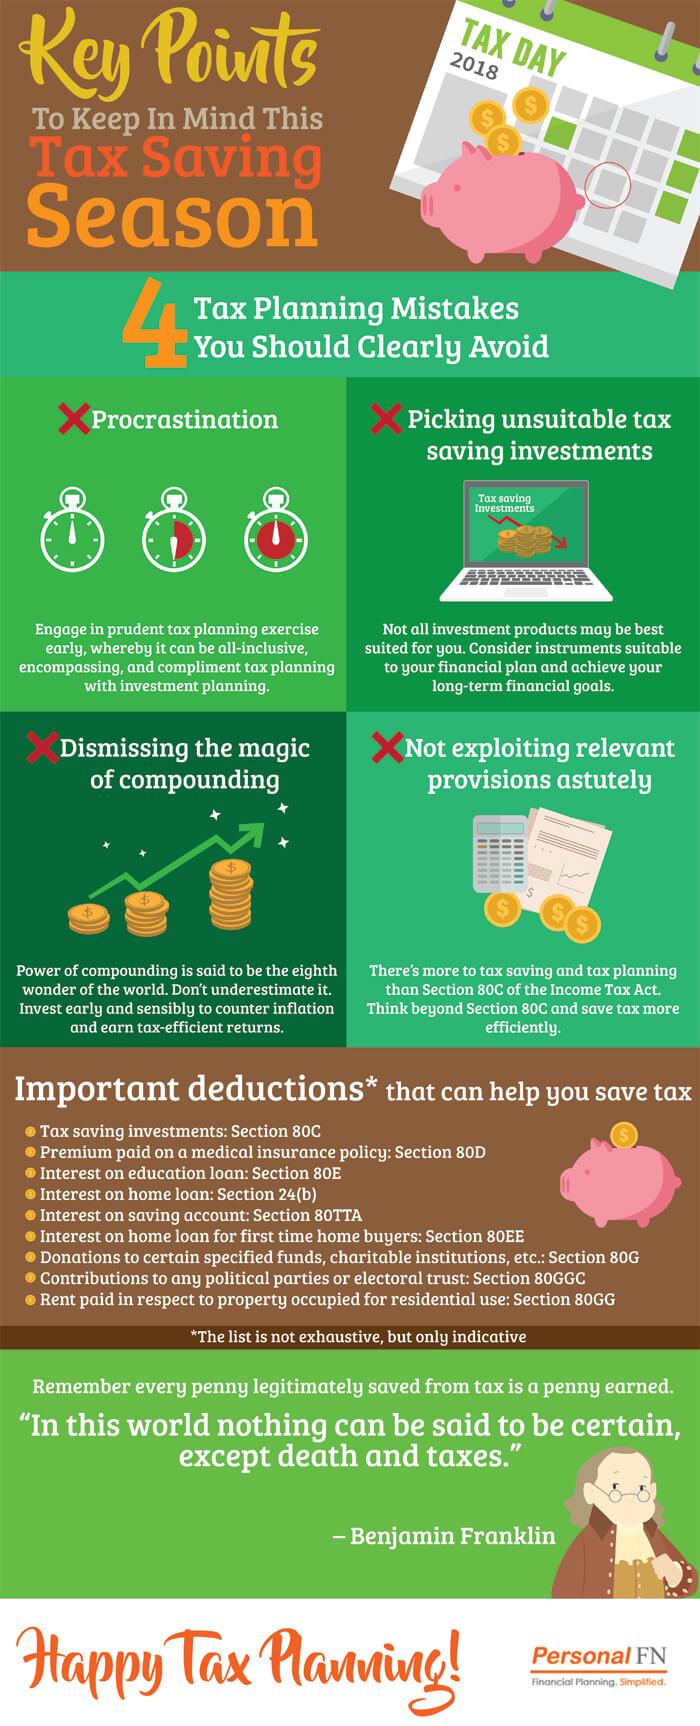 tax-saving-key-points